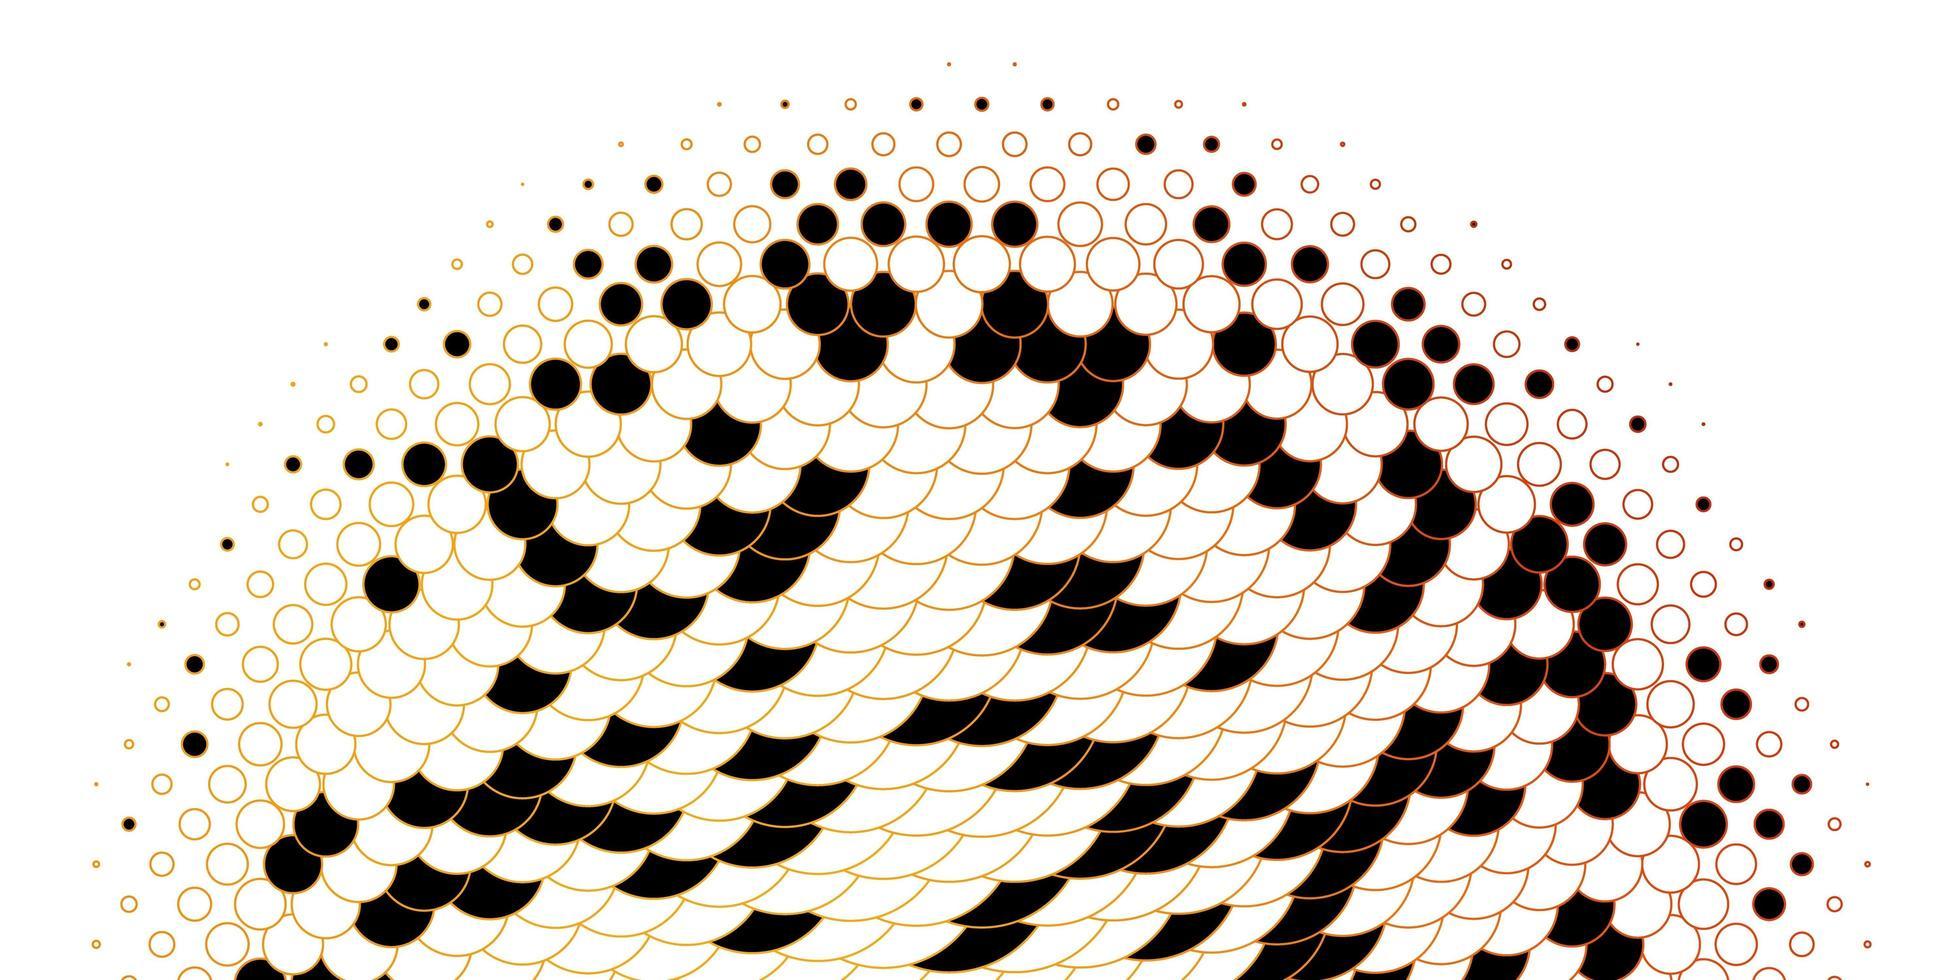 textura vector laranja clara com discos.